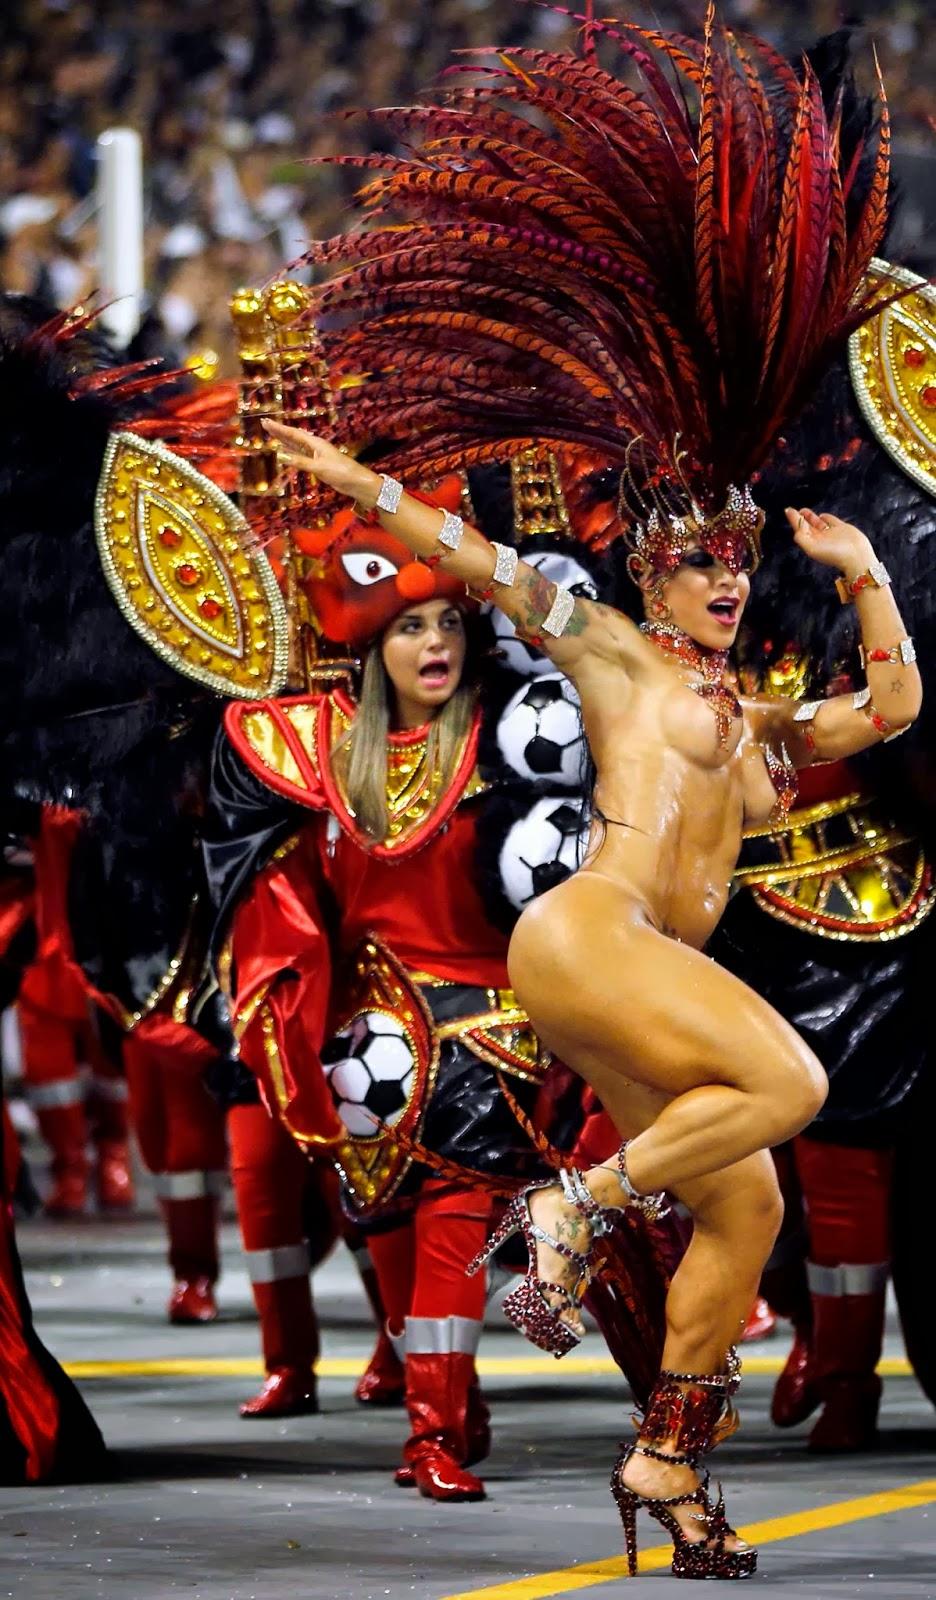 Brazil Carnival 2014 - Sambadrome enthusiasm